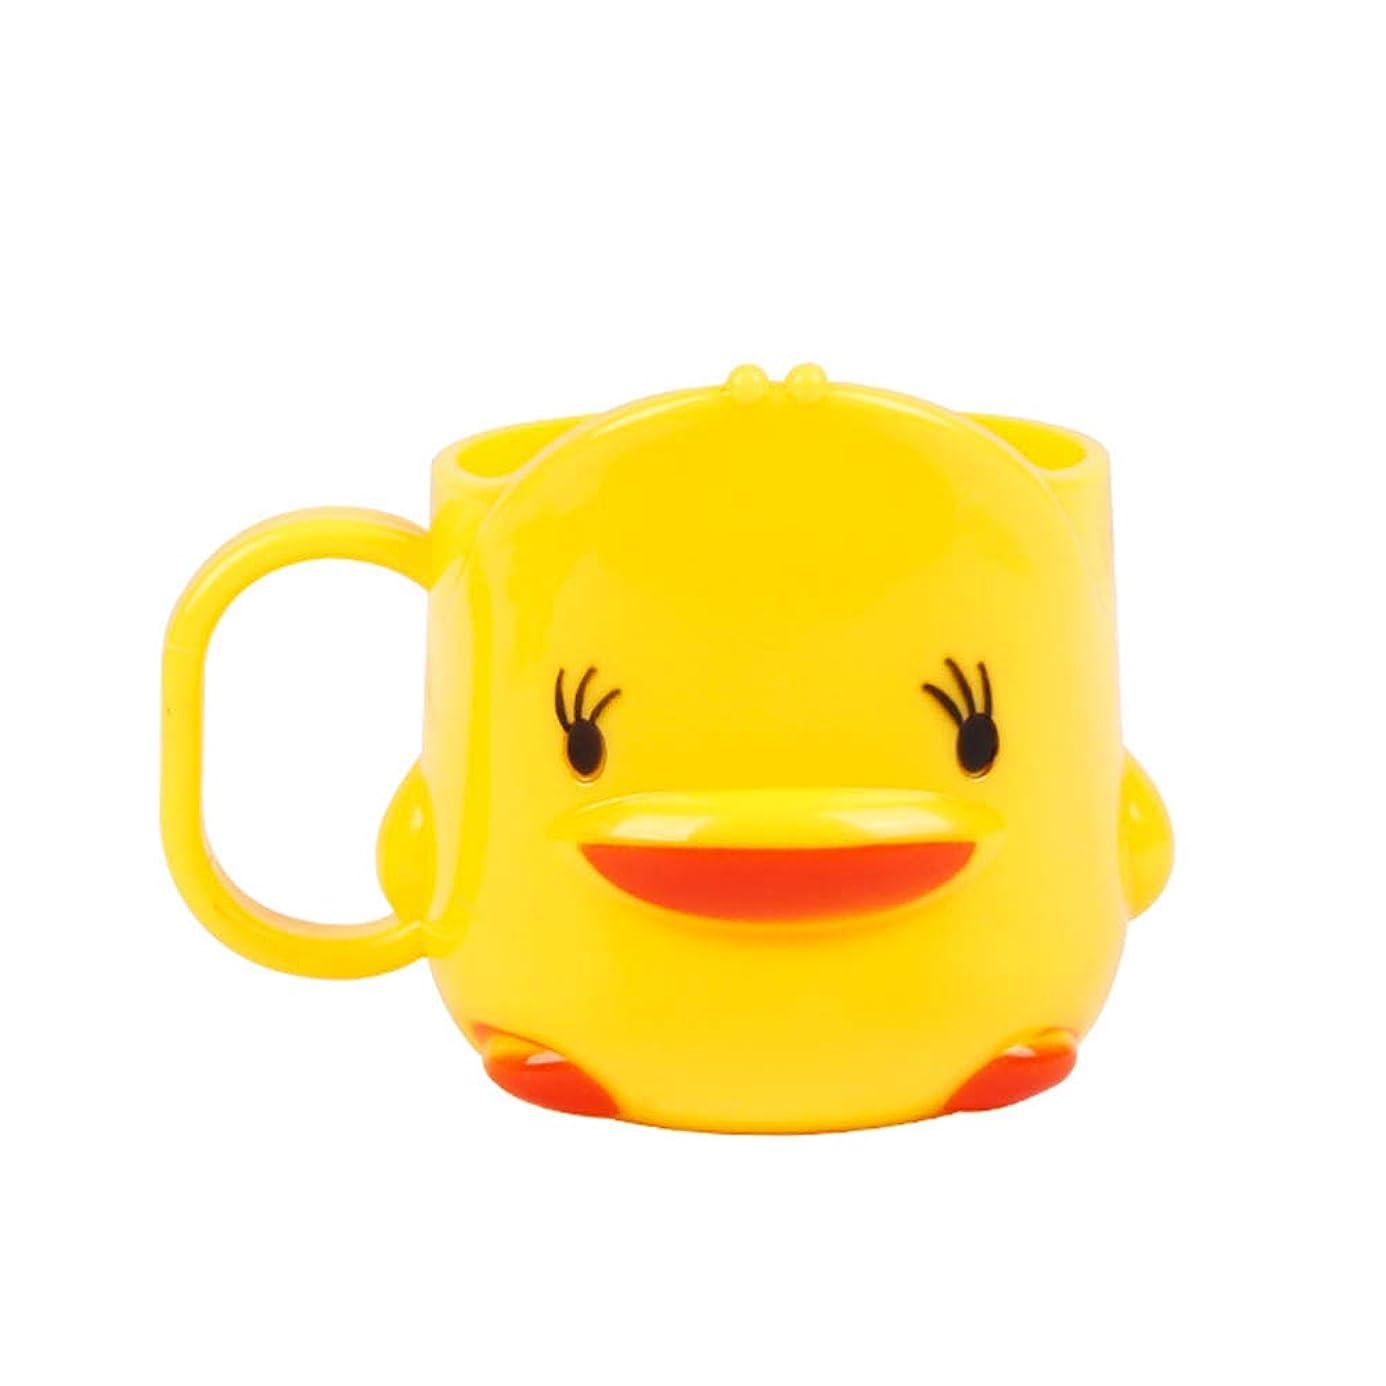 Softmusic Lovely Yellow Duck Kids Children Toothbrush Water Cup Yellow